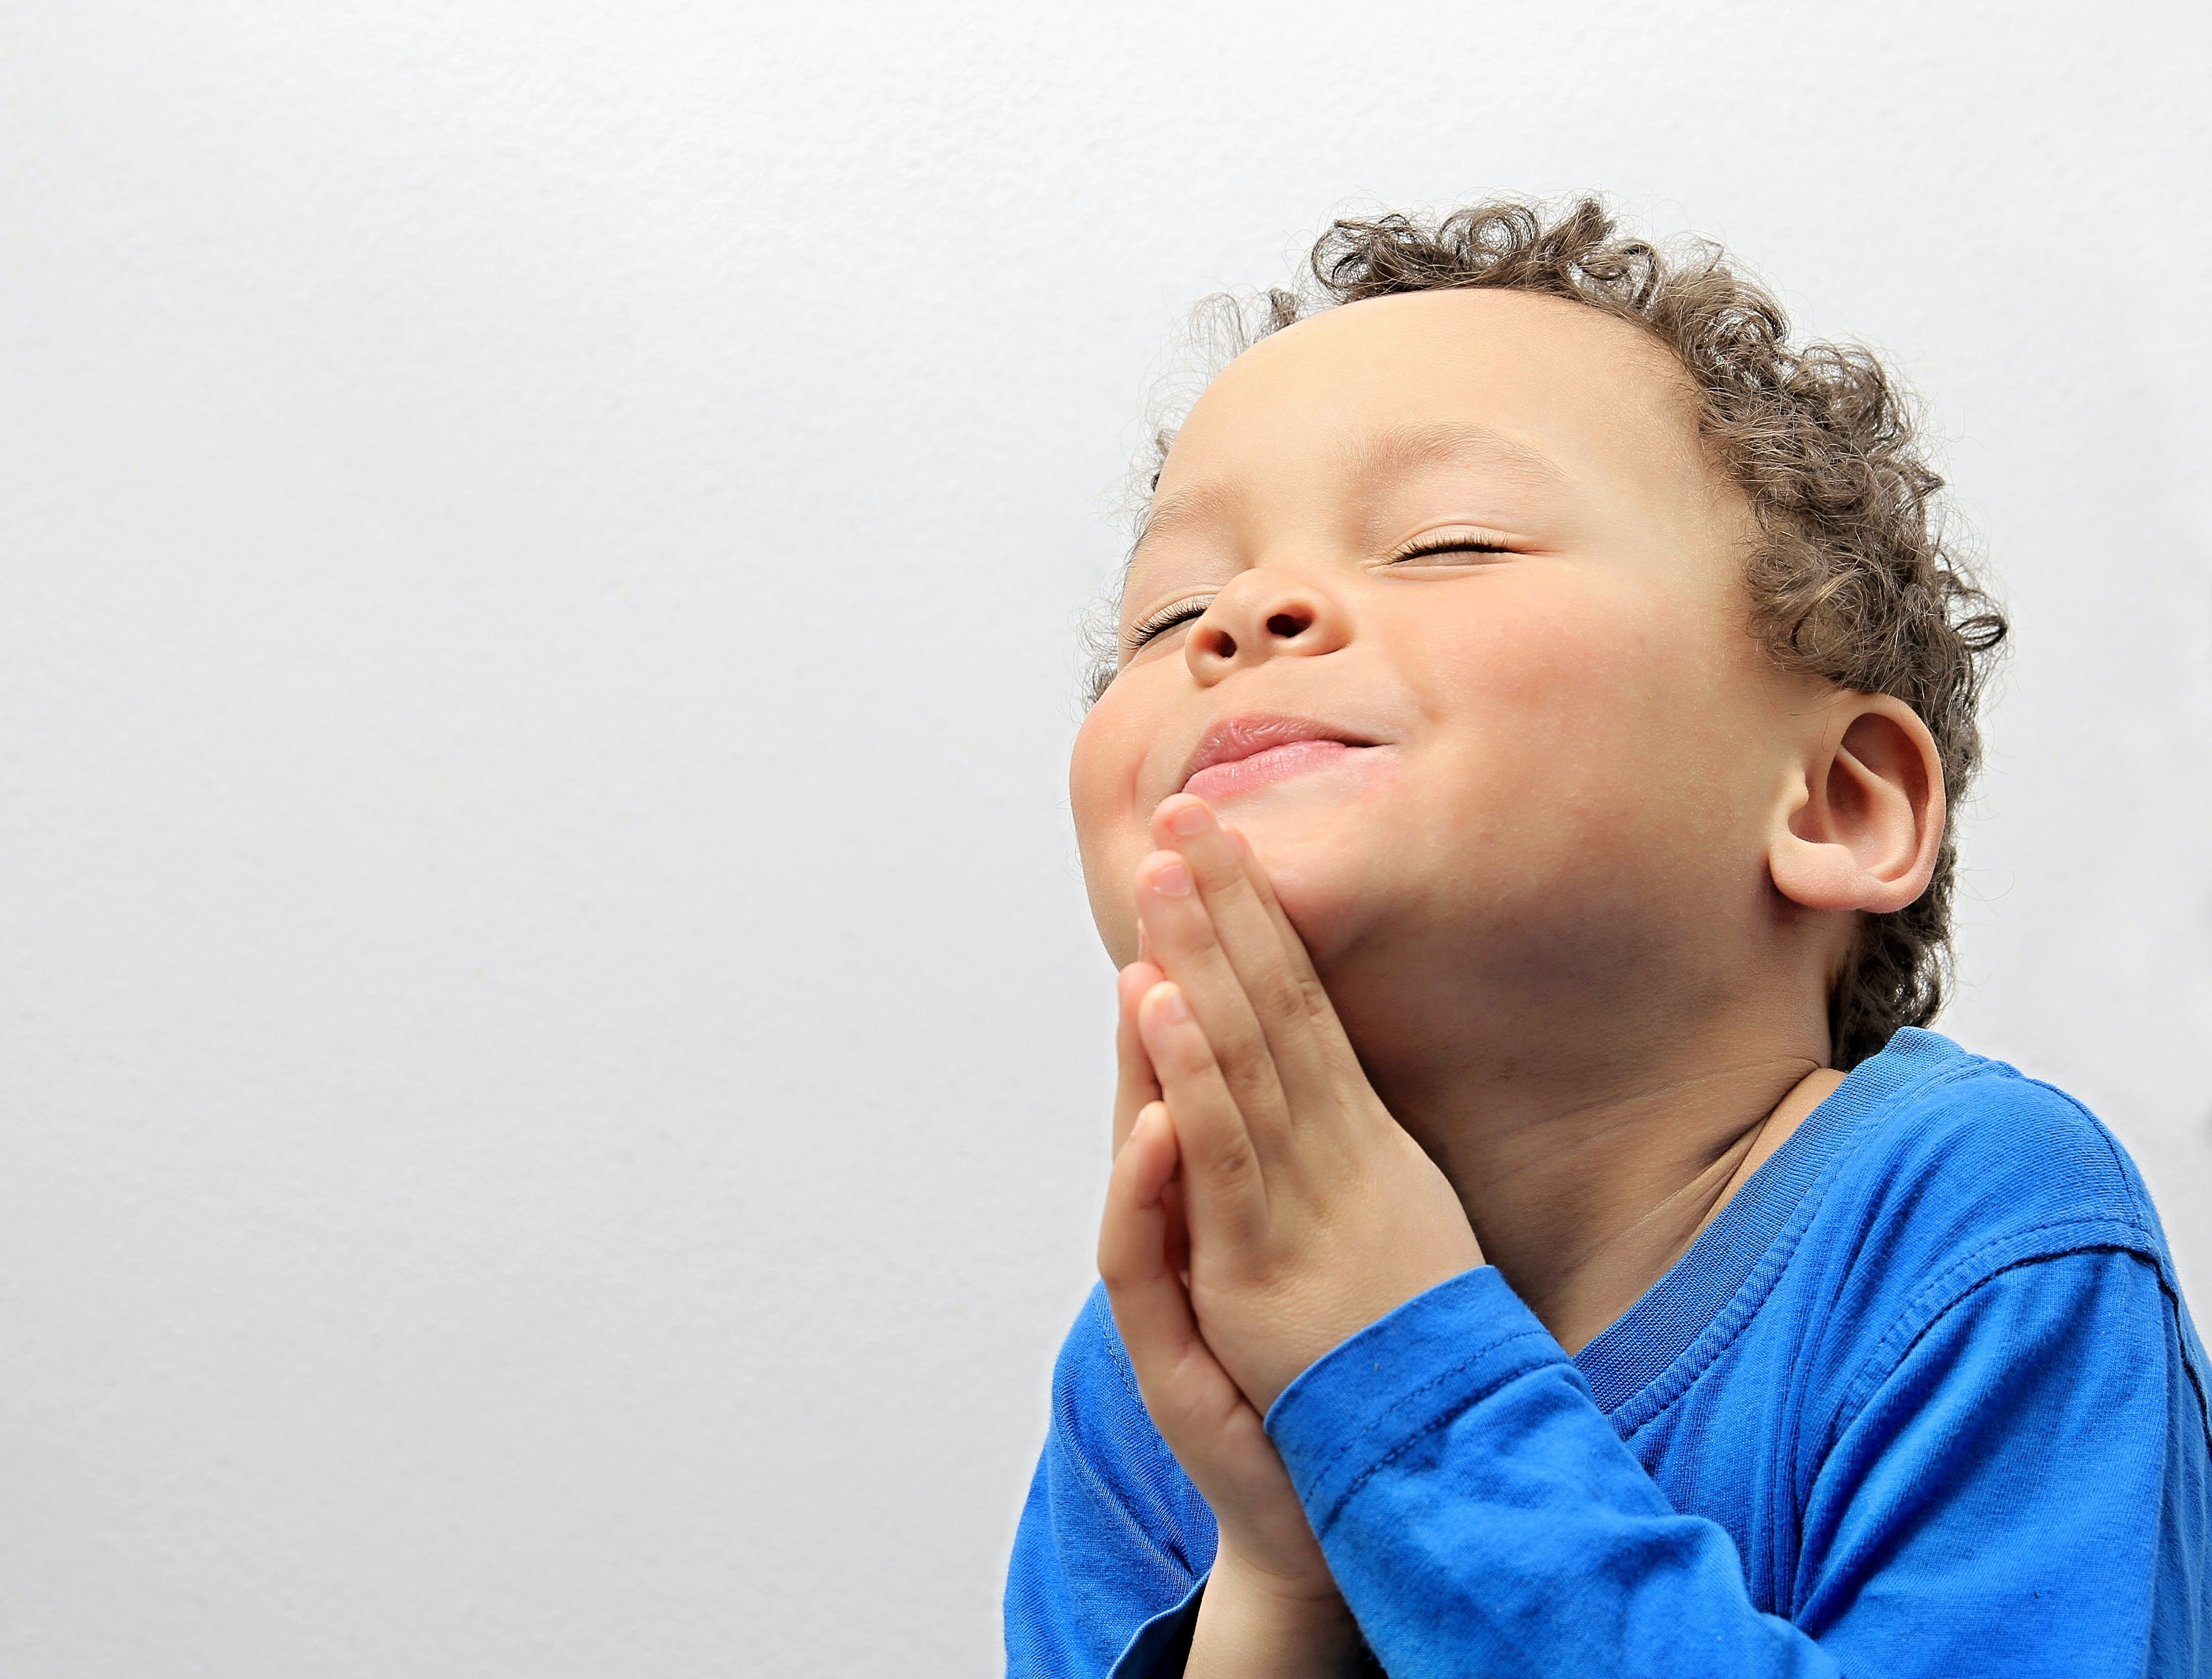 Boy praying.jpg?ixlib=rails 3.0